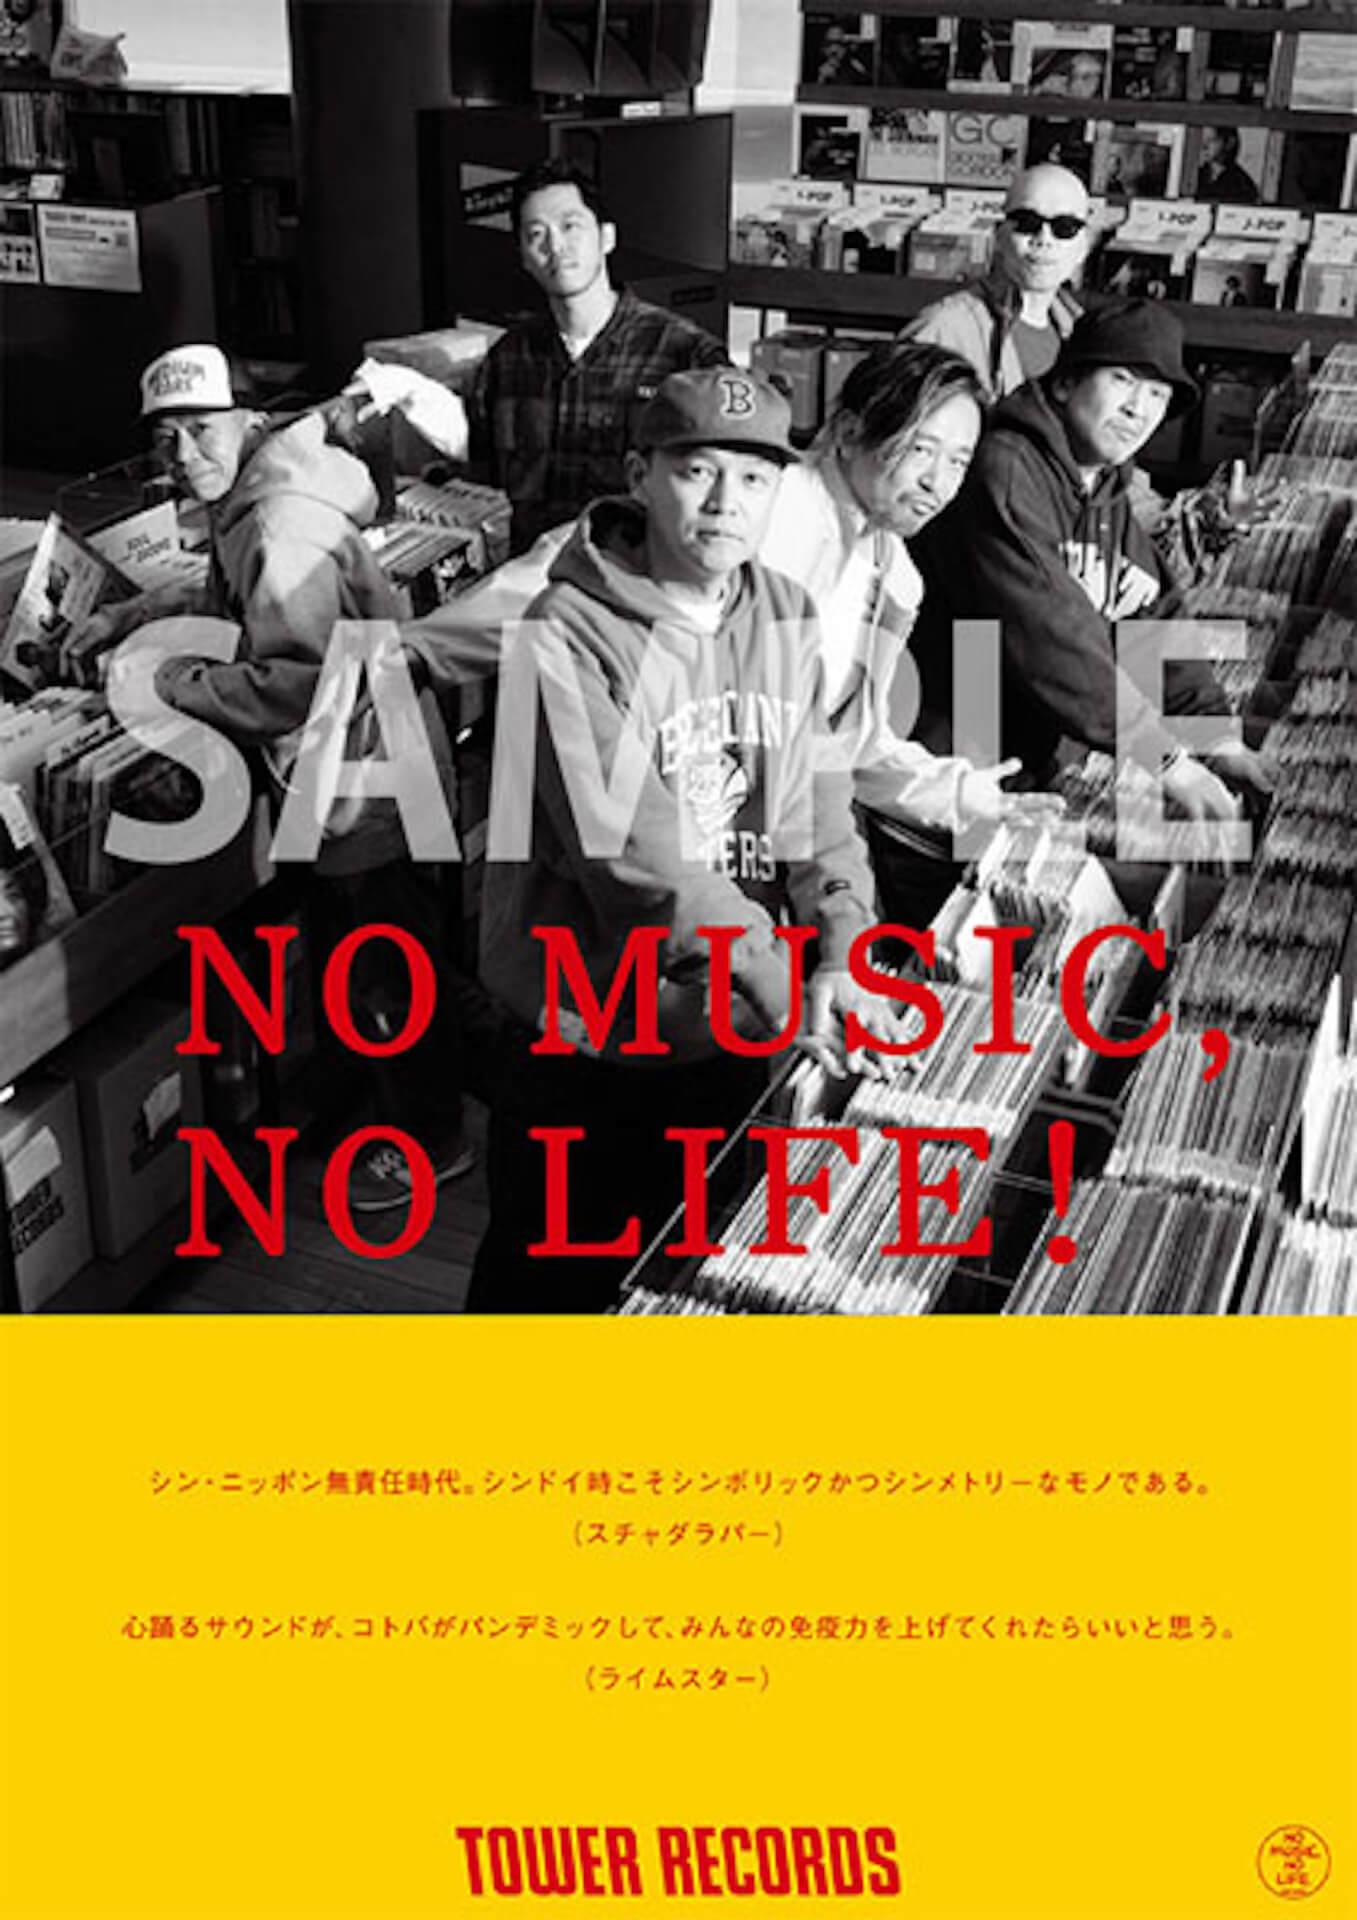 「NO MUSIC,NO LIFE.」ポスターに日本語ラップレジェンドのスチャダラパー×ライムスター、Zeebra×SOUL SCREAMが登場! music200406_nomusicnolife_07